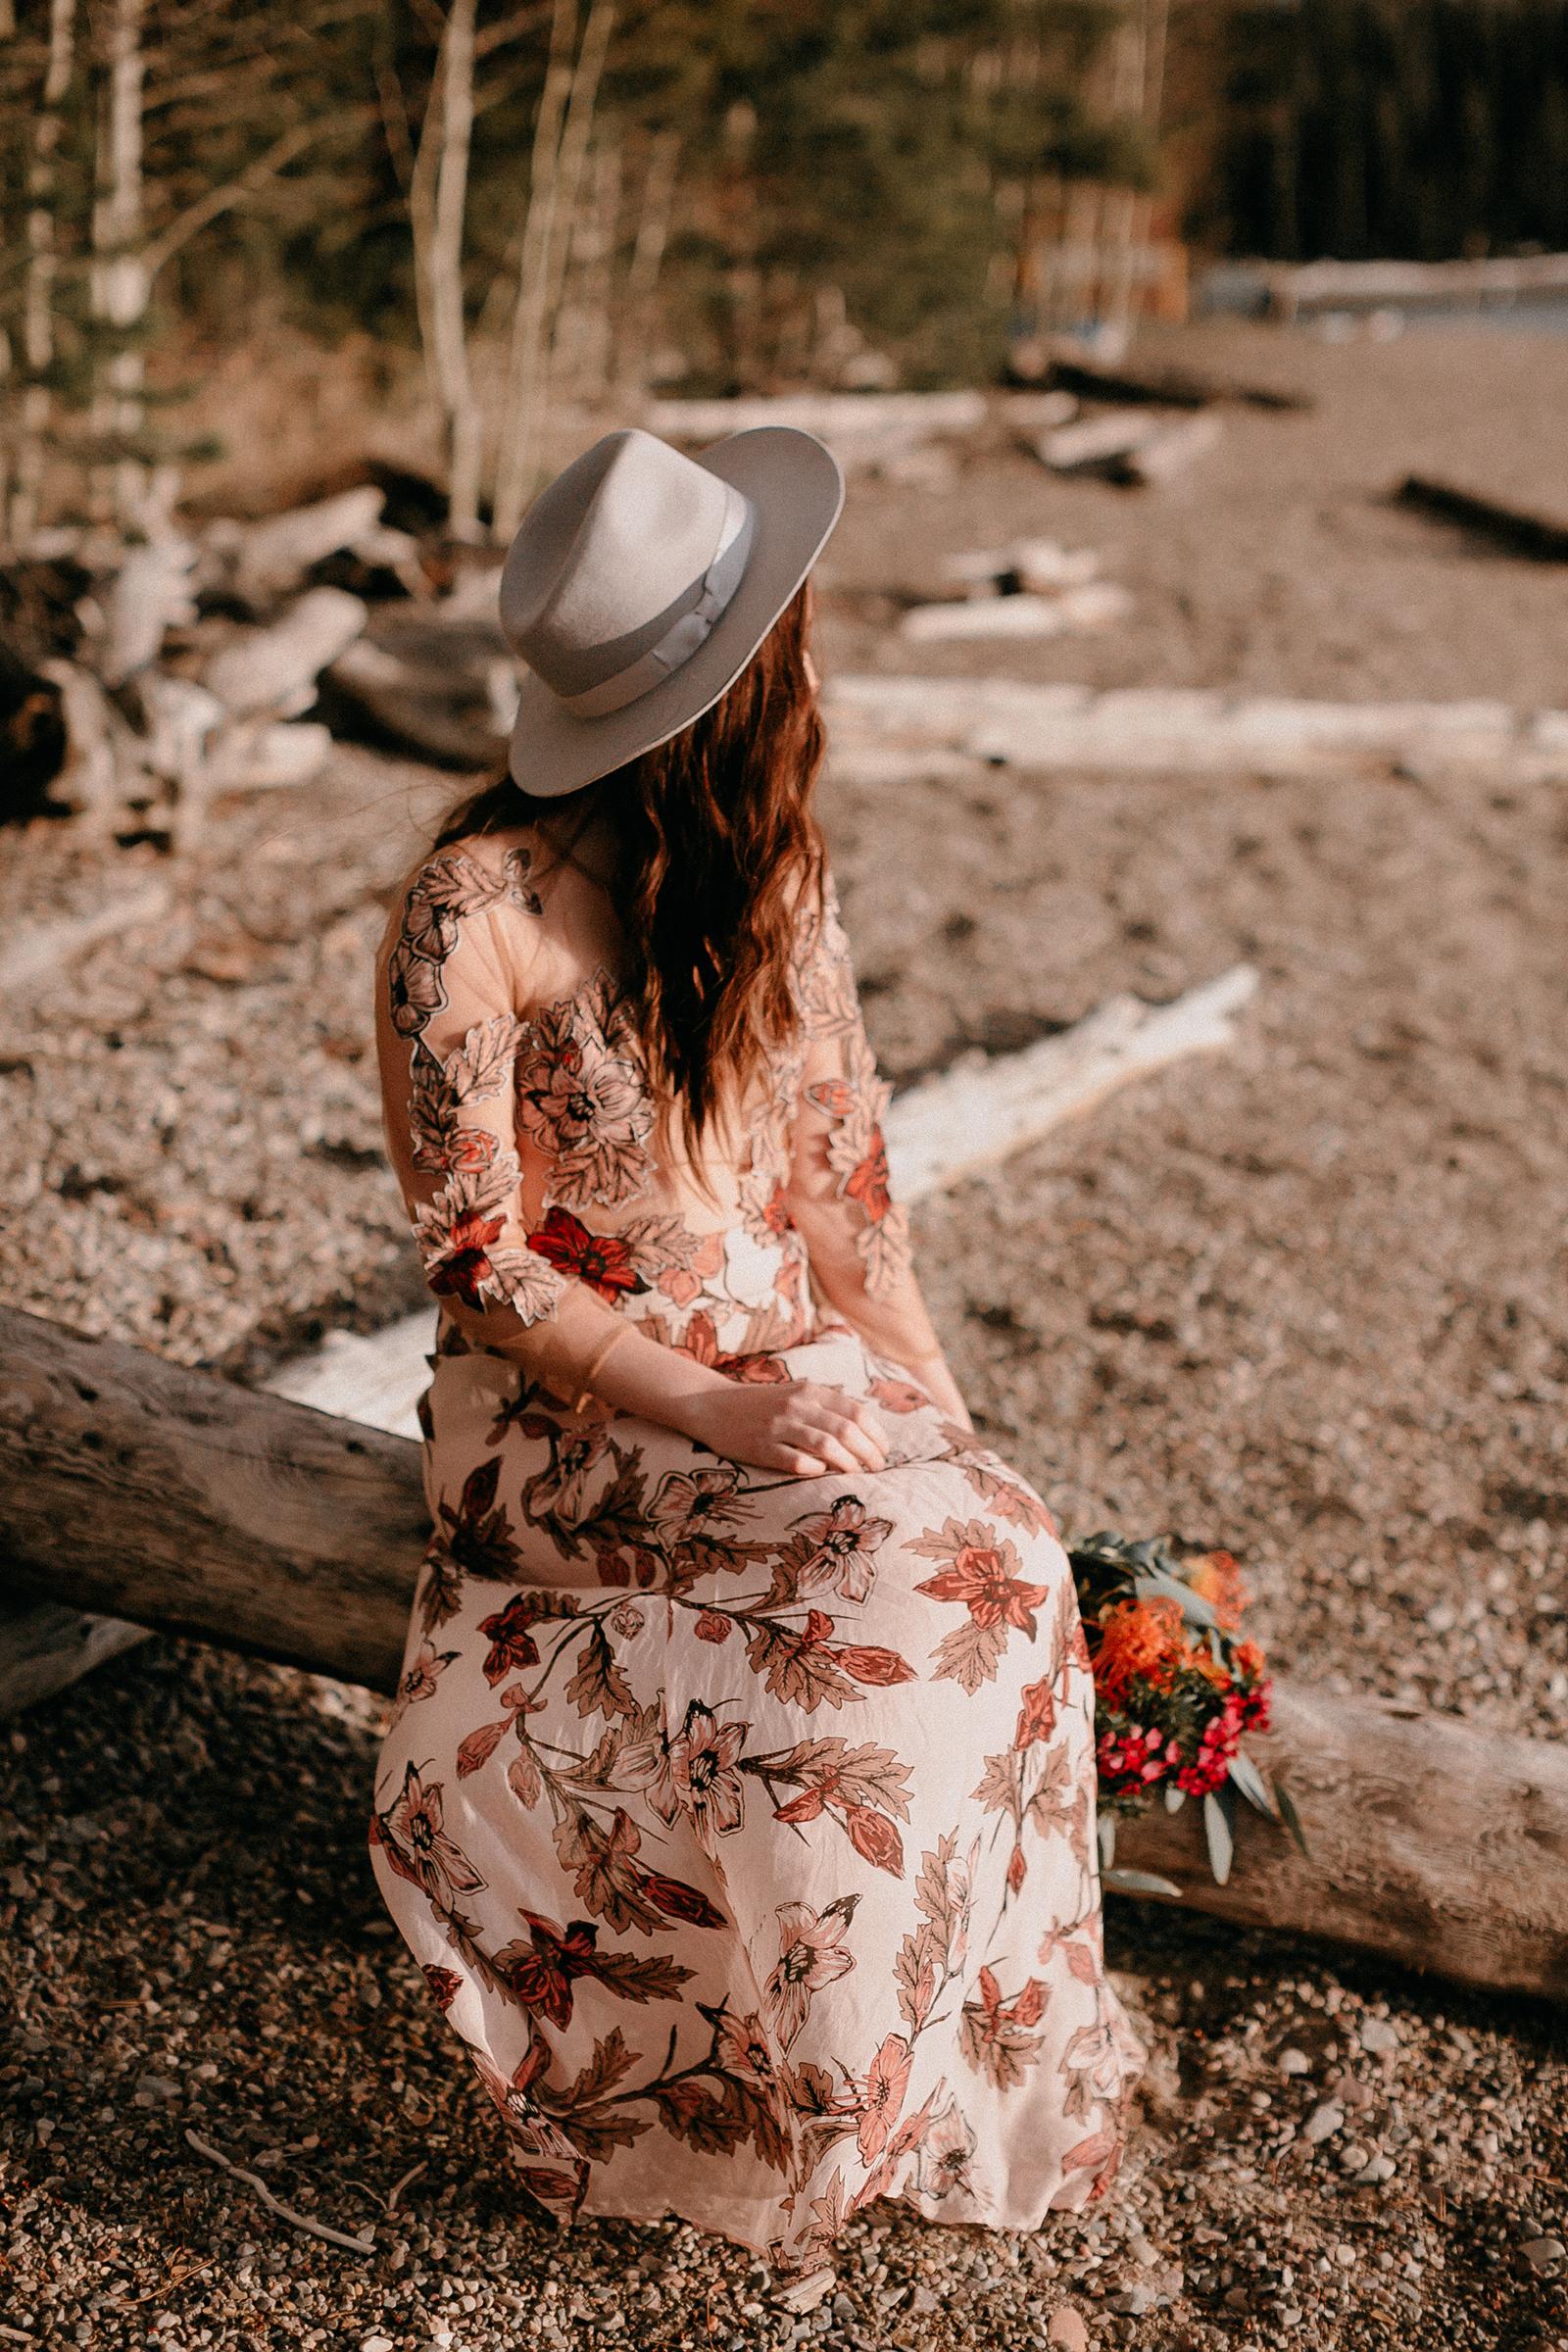 Andrea Ley Grand Teton Tetons National Park Jackson Jacksonhole Jackson hole Wy Wyo Wyoming Yellowstone Moran Wedding Elope Elopement Eloping Photography Love Couple Photographer Inimate Wedding For Love and Lemons Lack of Color Liz Osban Cheyenne061.jpg